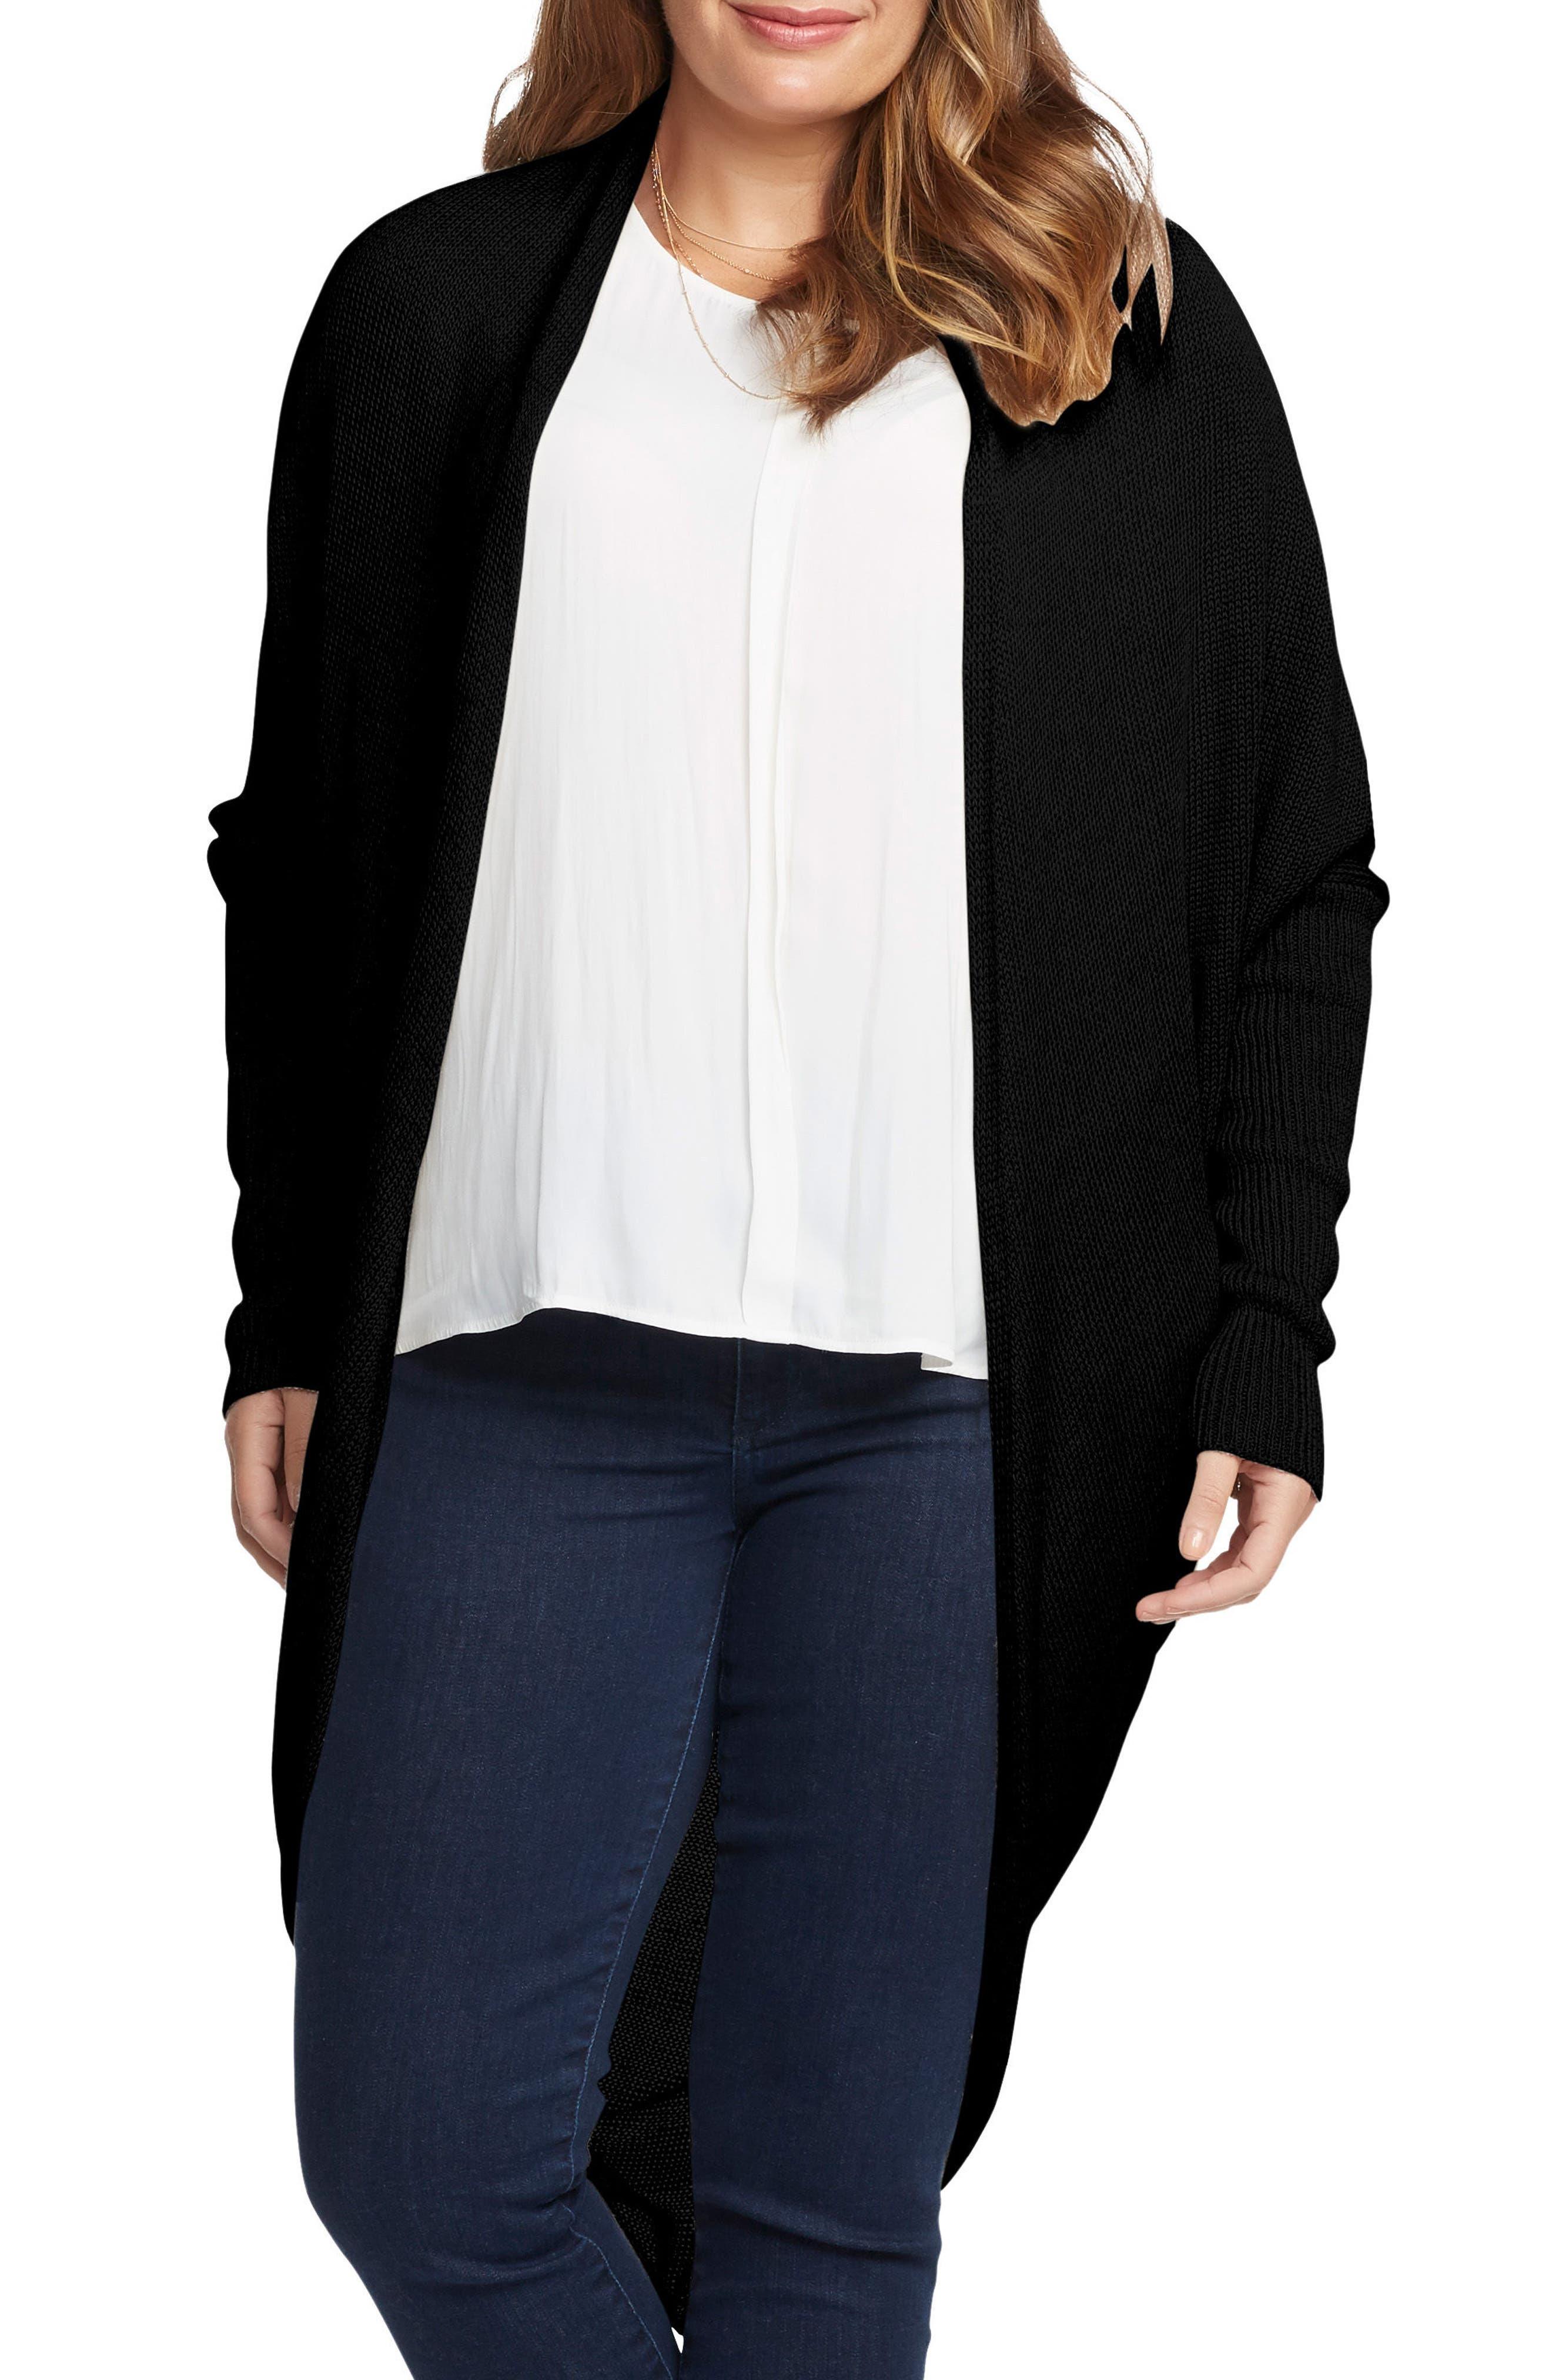 Main Image - Tart Darla Linen Blend Open Cardigan (Plus Size)